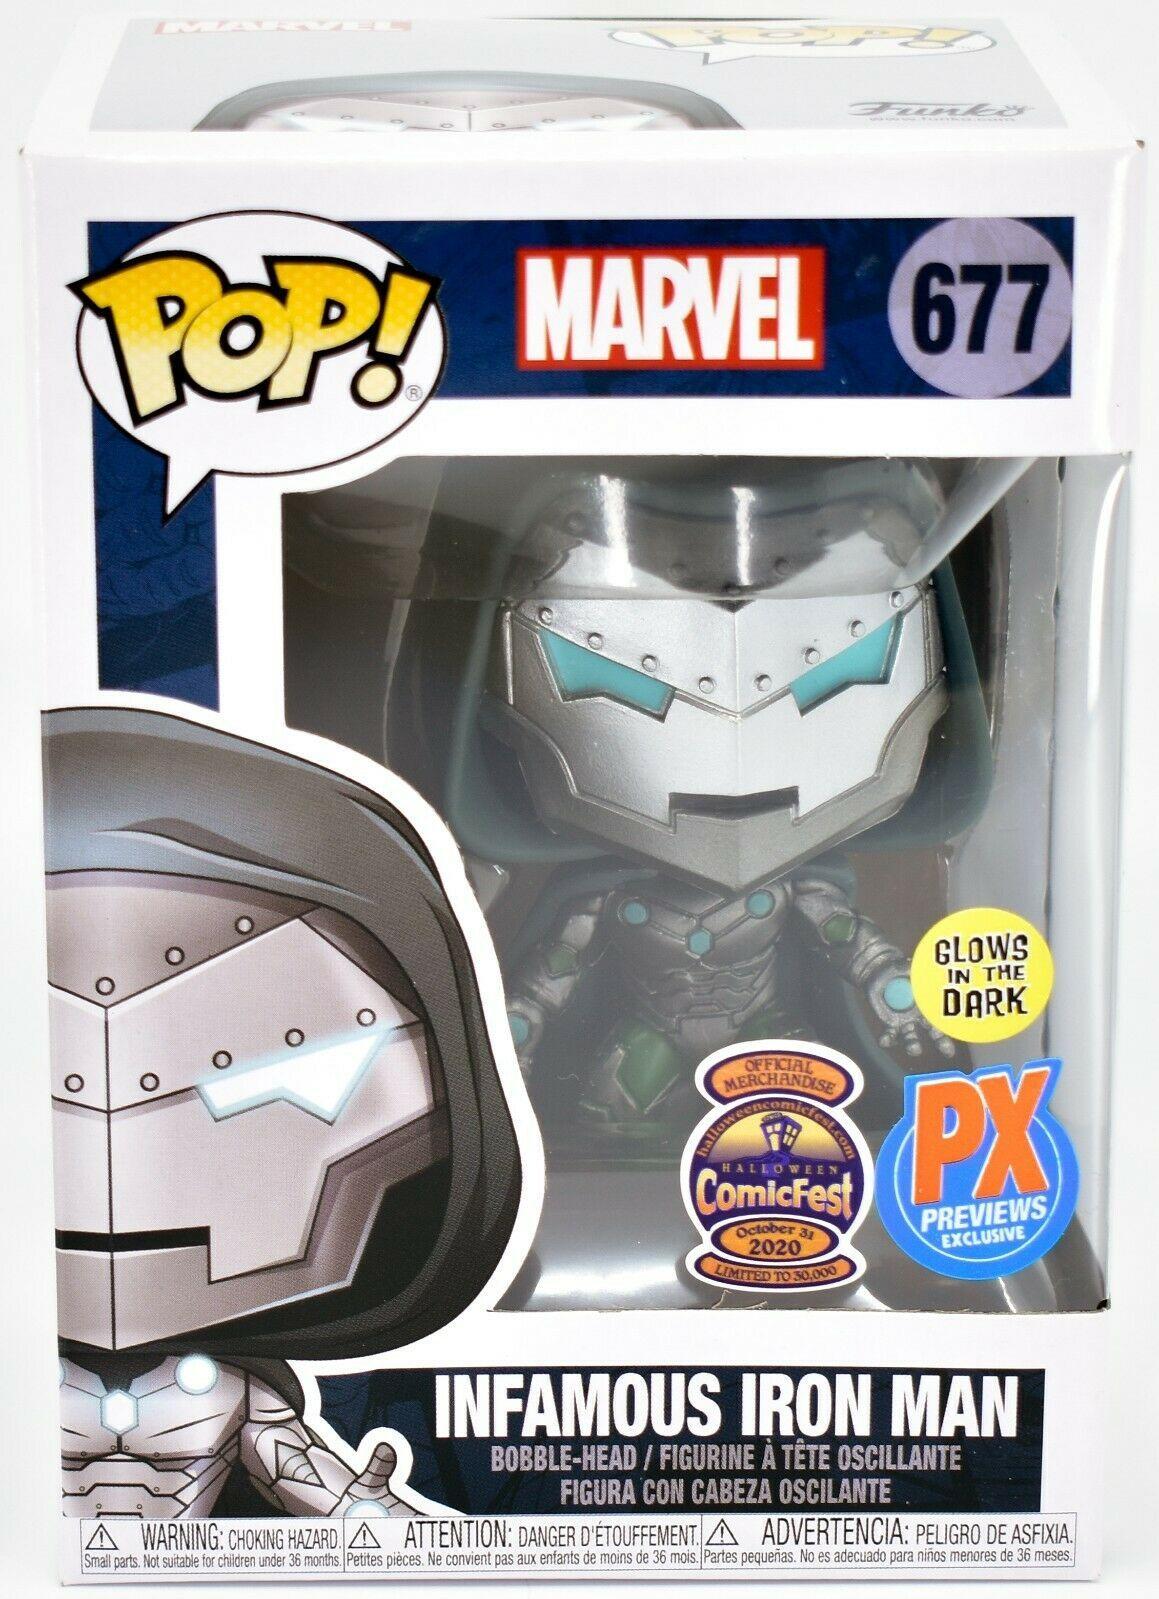 Funko Pop Marvel Infamous Iron Man 677 Halloween ComicFest 2020 PX Exclusive